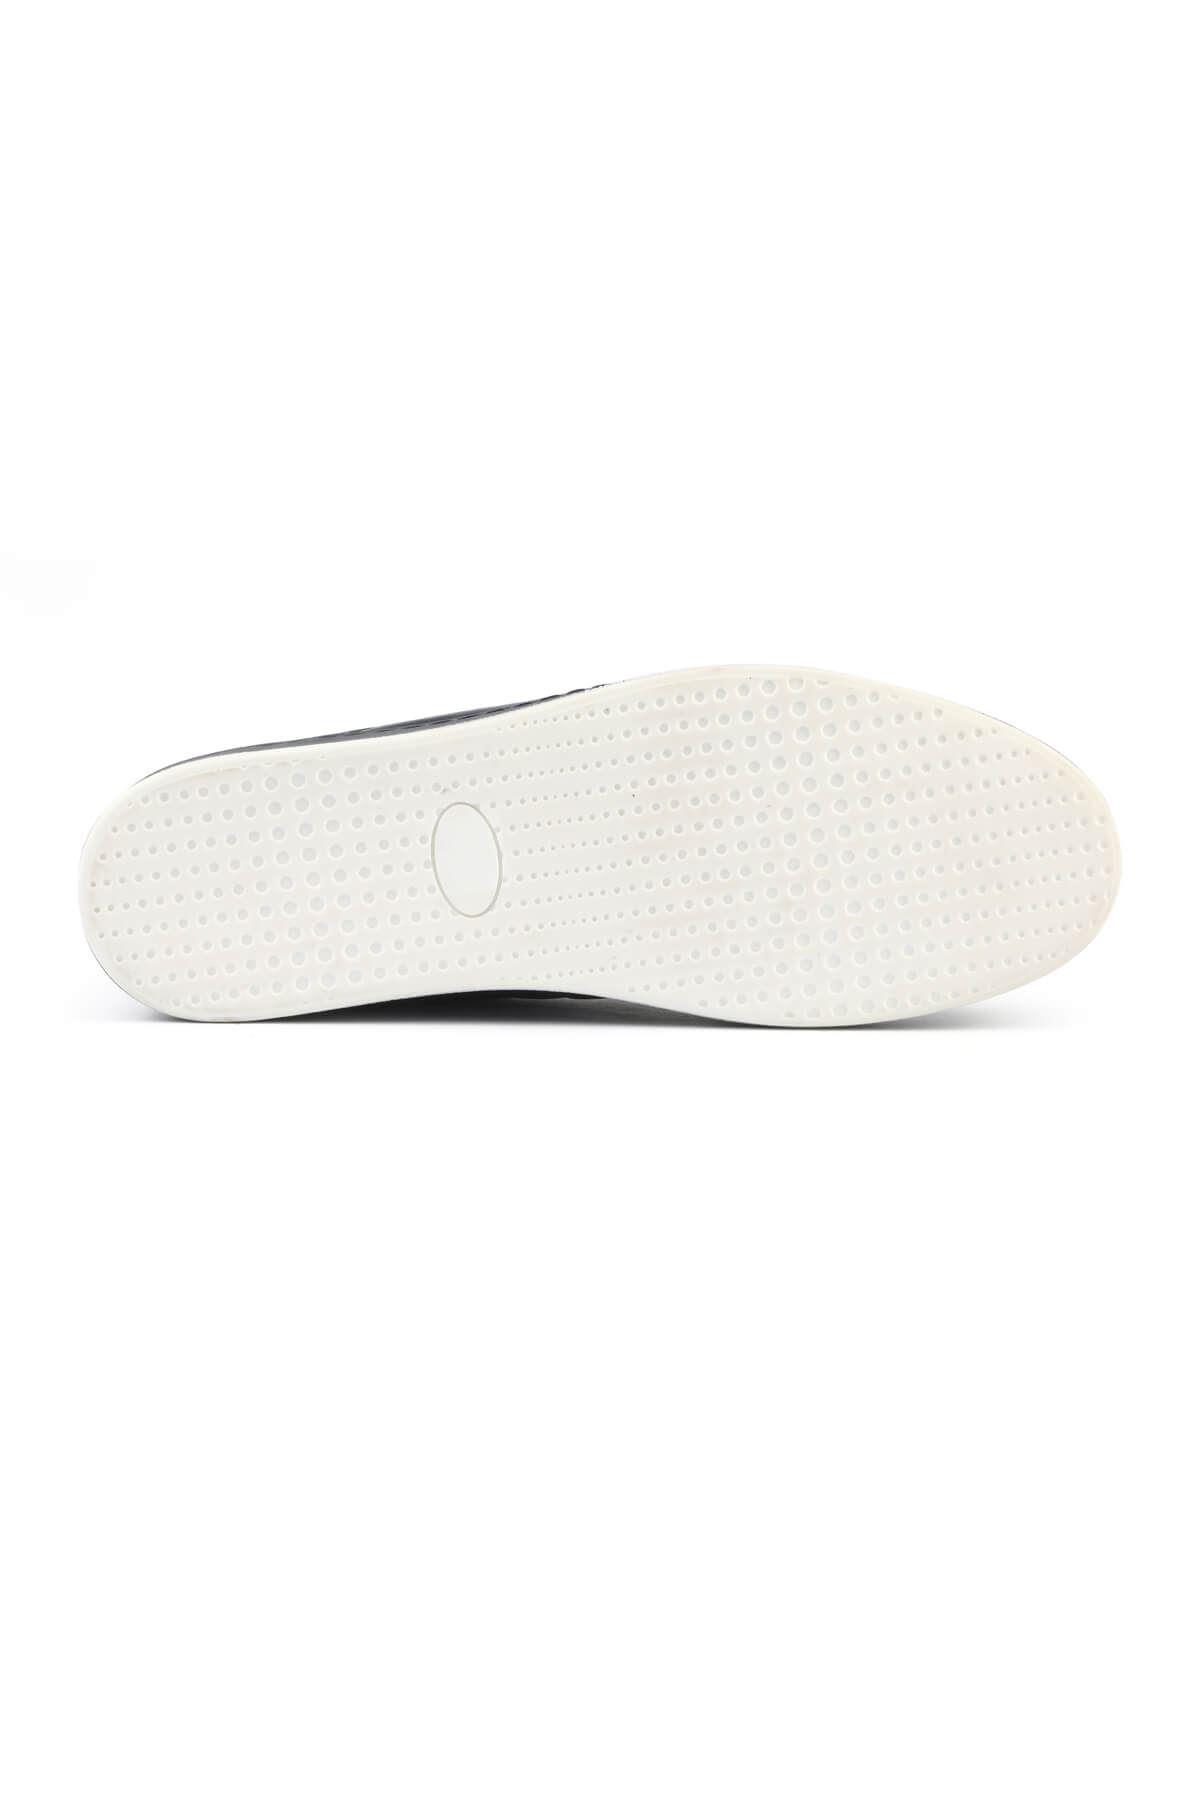 Libero 3105 Lacivert Sneaker Ayakkabı